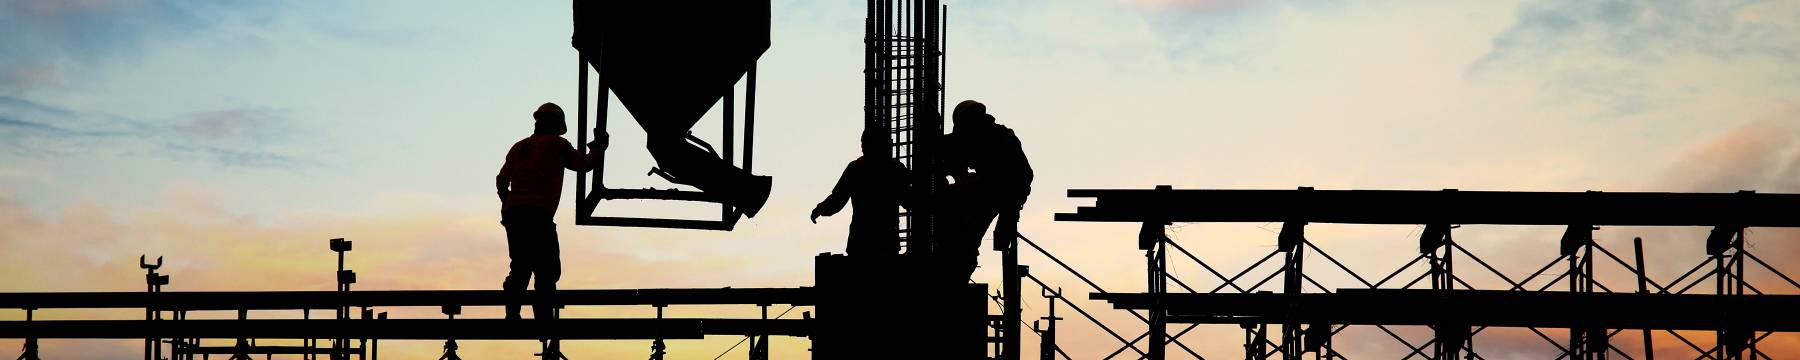 Financing for refurbishment, construction and development